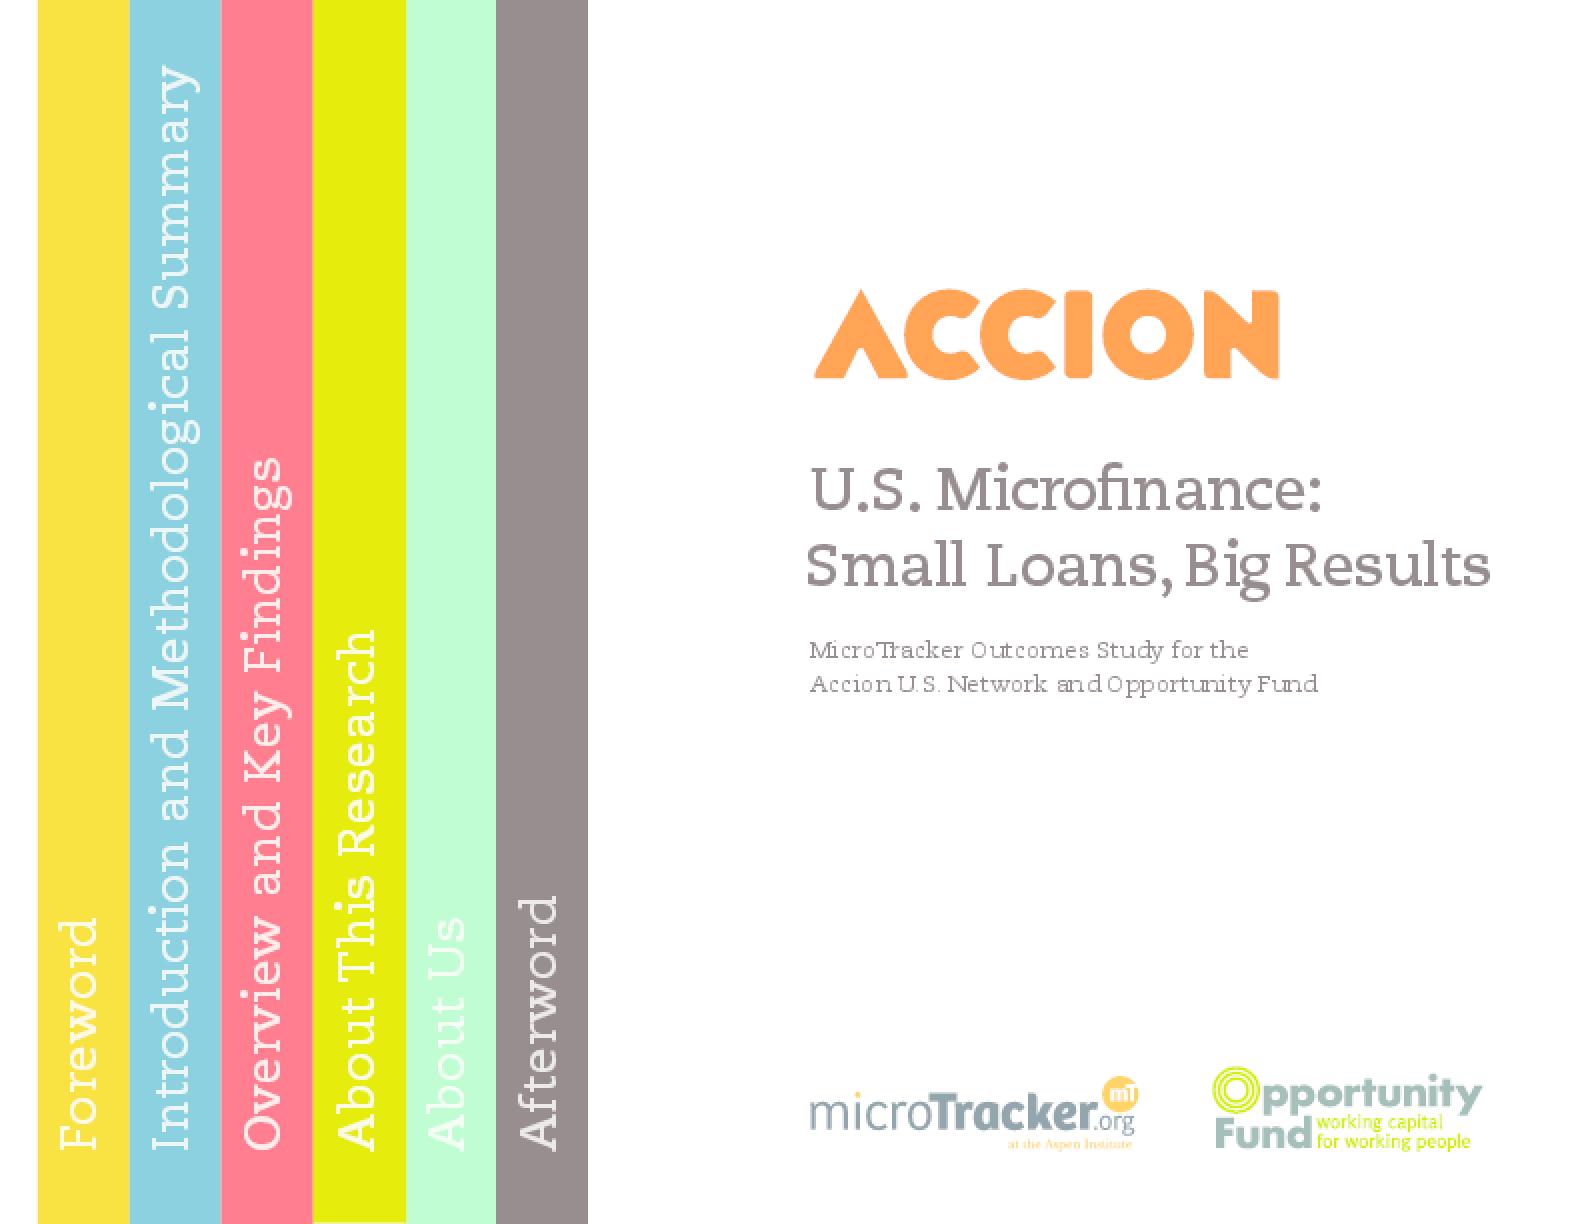 U.S. Microfinance: Small Loans, Big Results